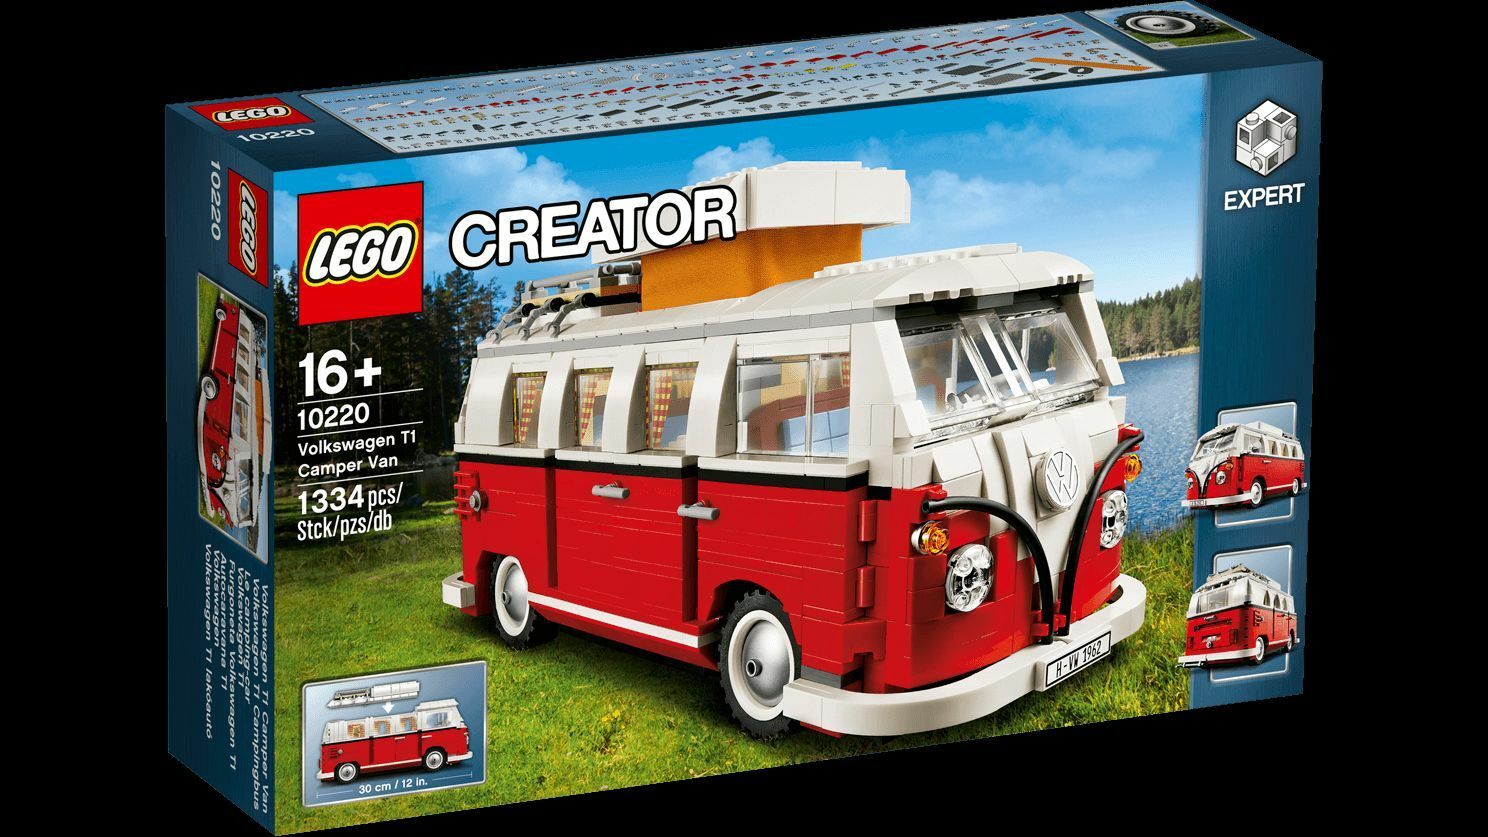 LEGO CREATOR 10220 VW VOLKSWAGEN T1 CAMPER VAN BULLI ROT / Weiß VERY RARE BNMIB